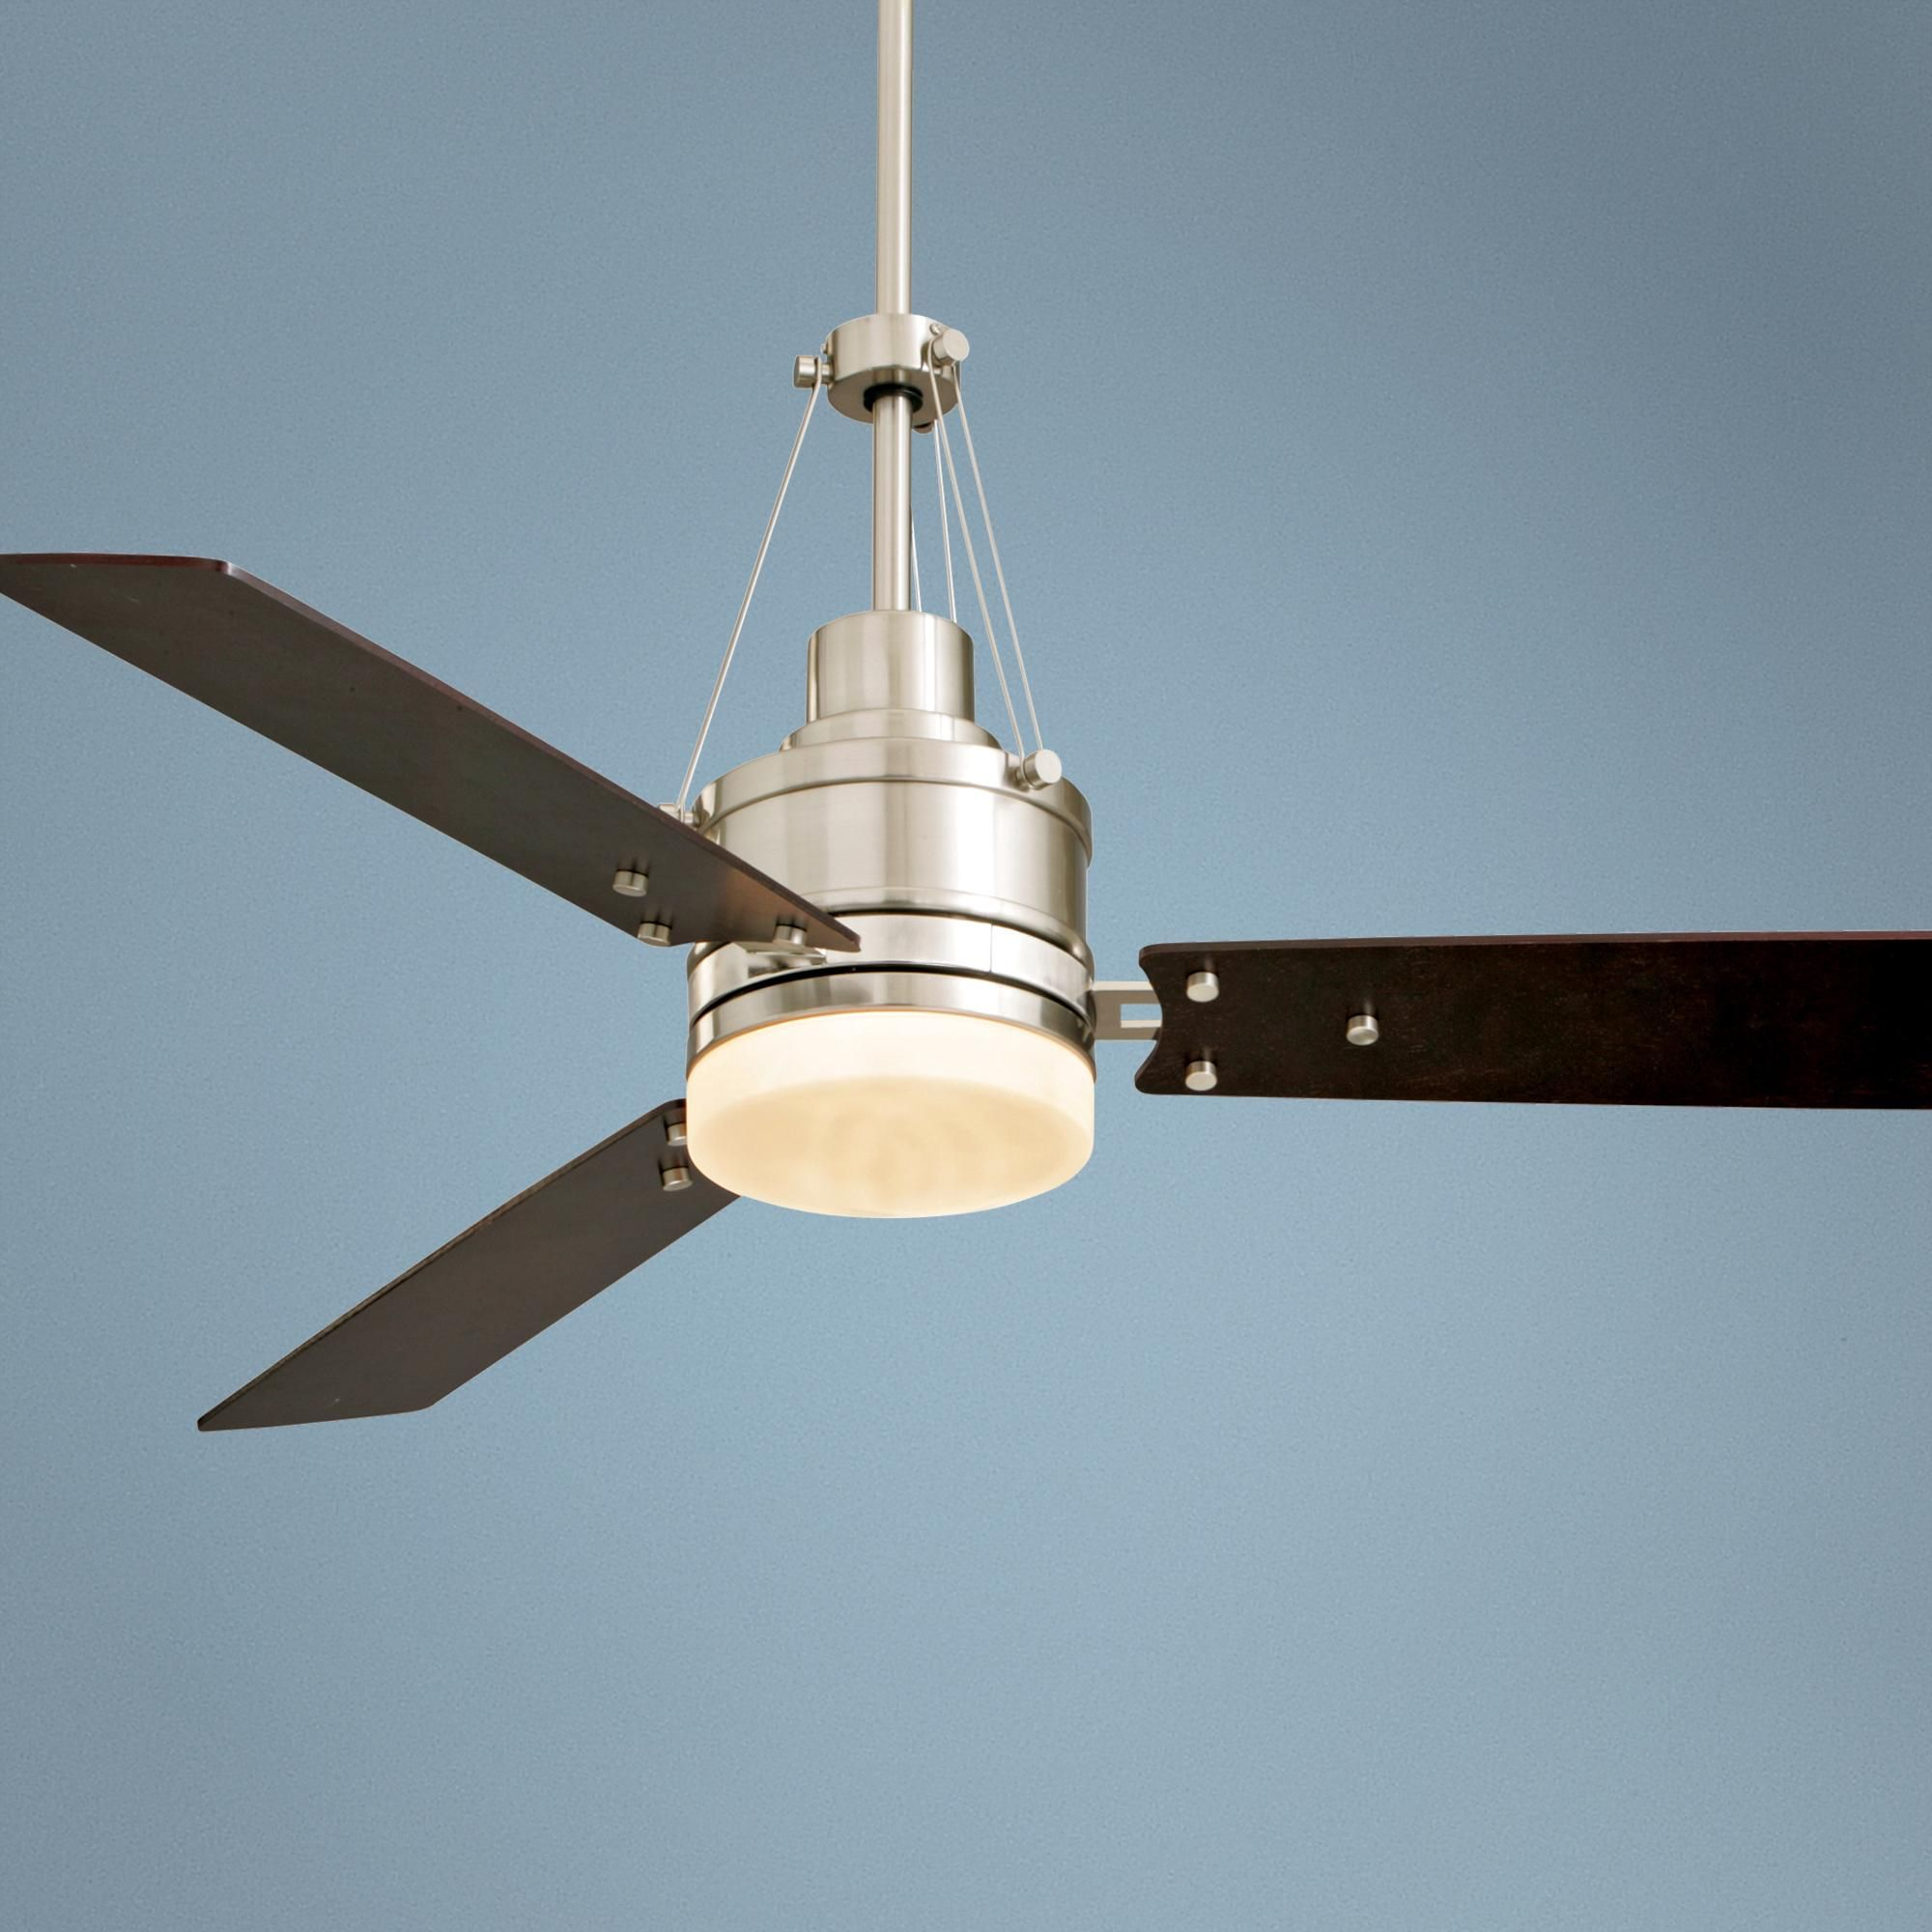 54 Highpointe Brushed Steel Finish Ceiling Fan Ceiling Fan Fan Light Ceiling Fan With Light